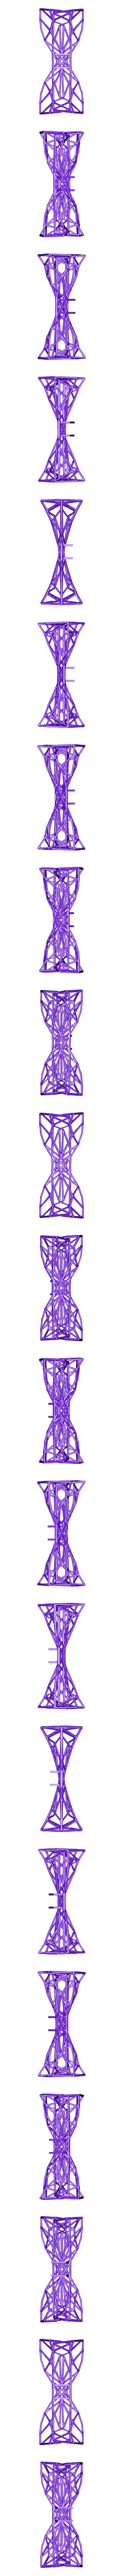 geo_bowtie.OBJ Download OBJ file Geometric Bow Tie • 3D printing object, Merve